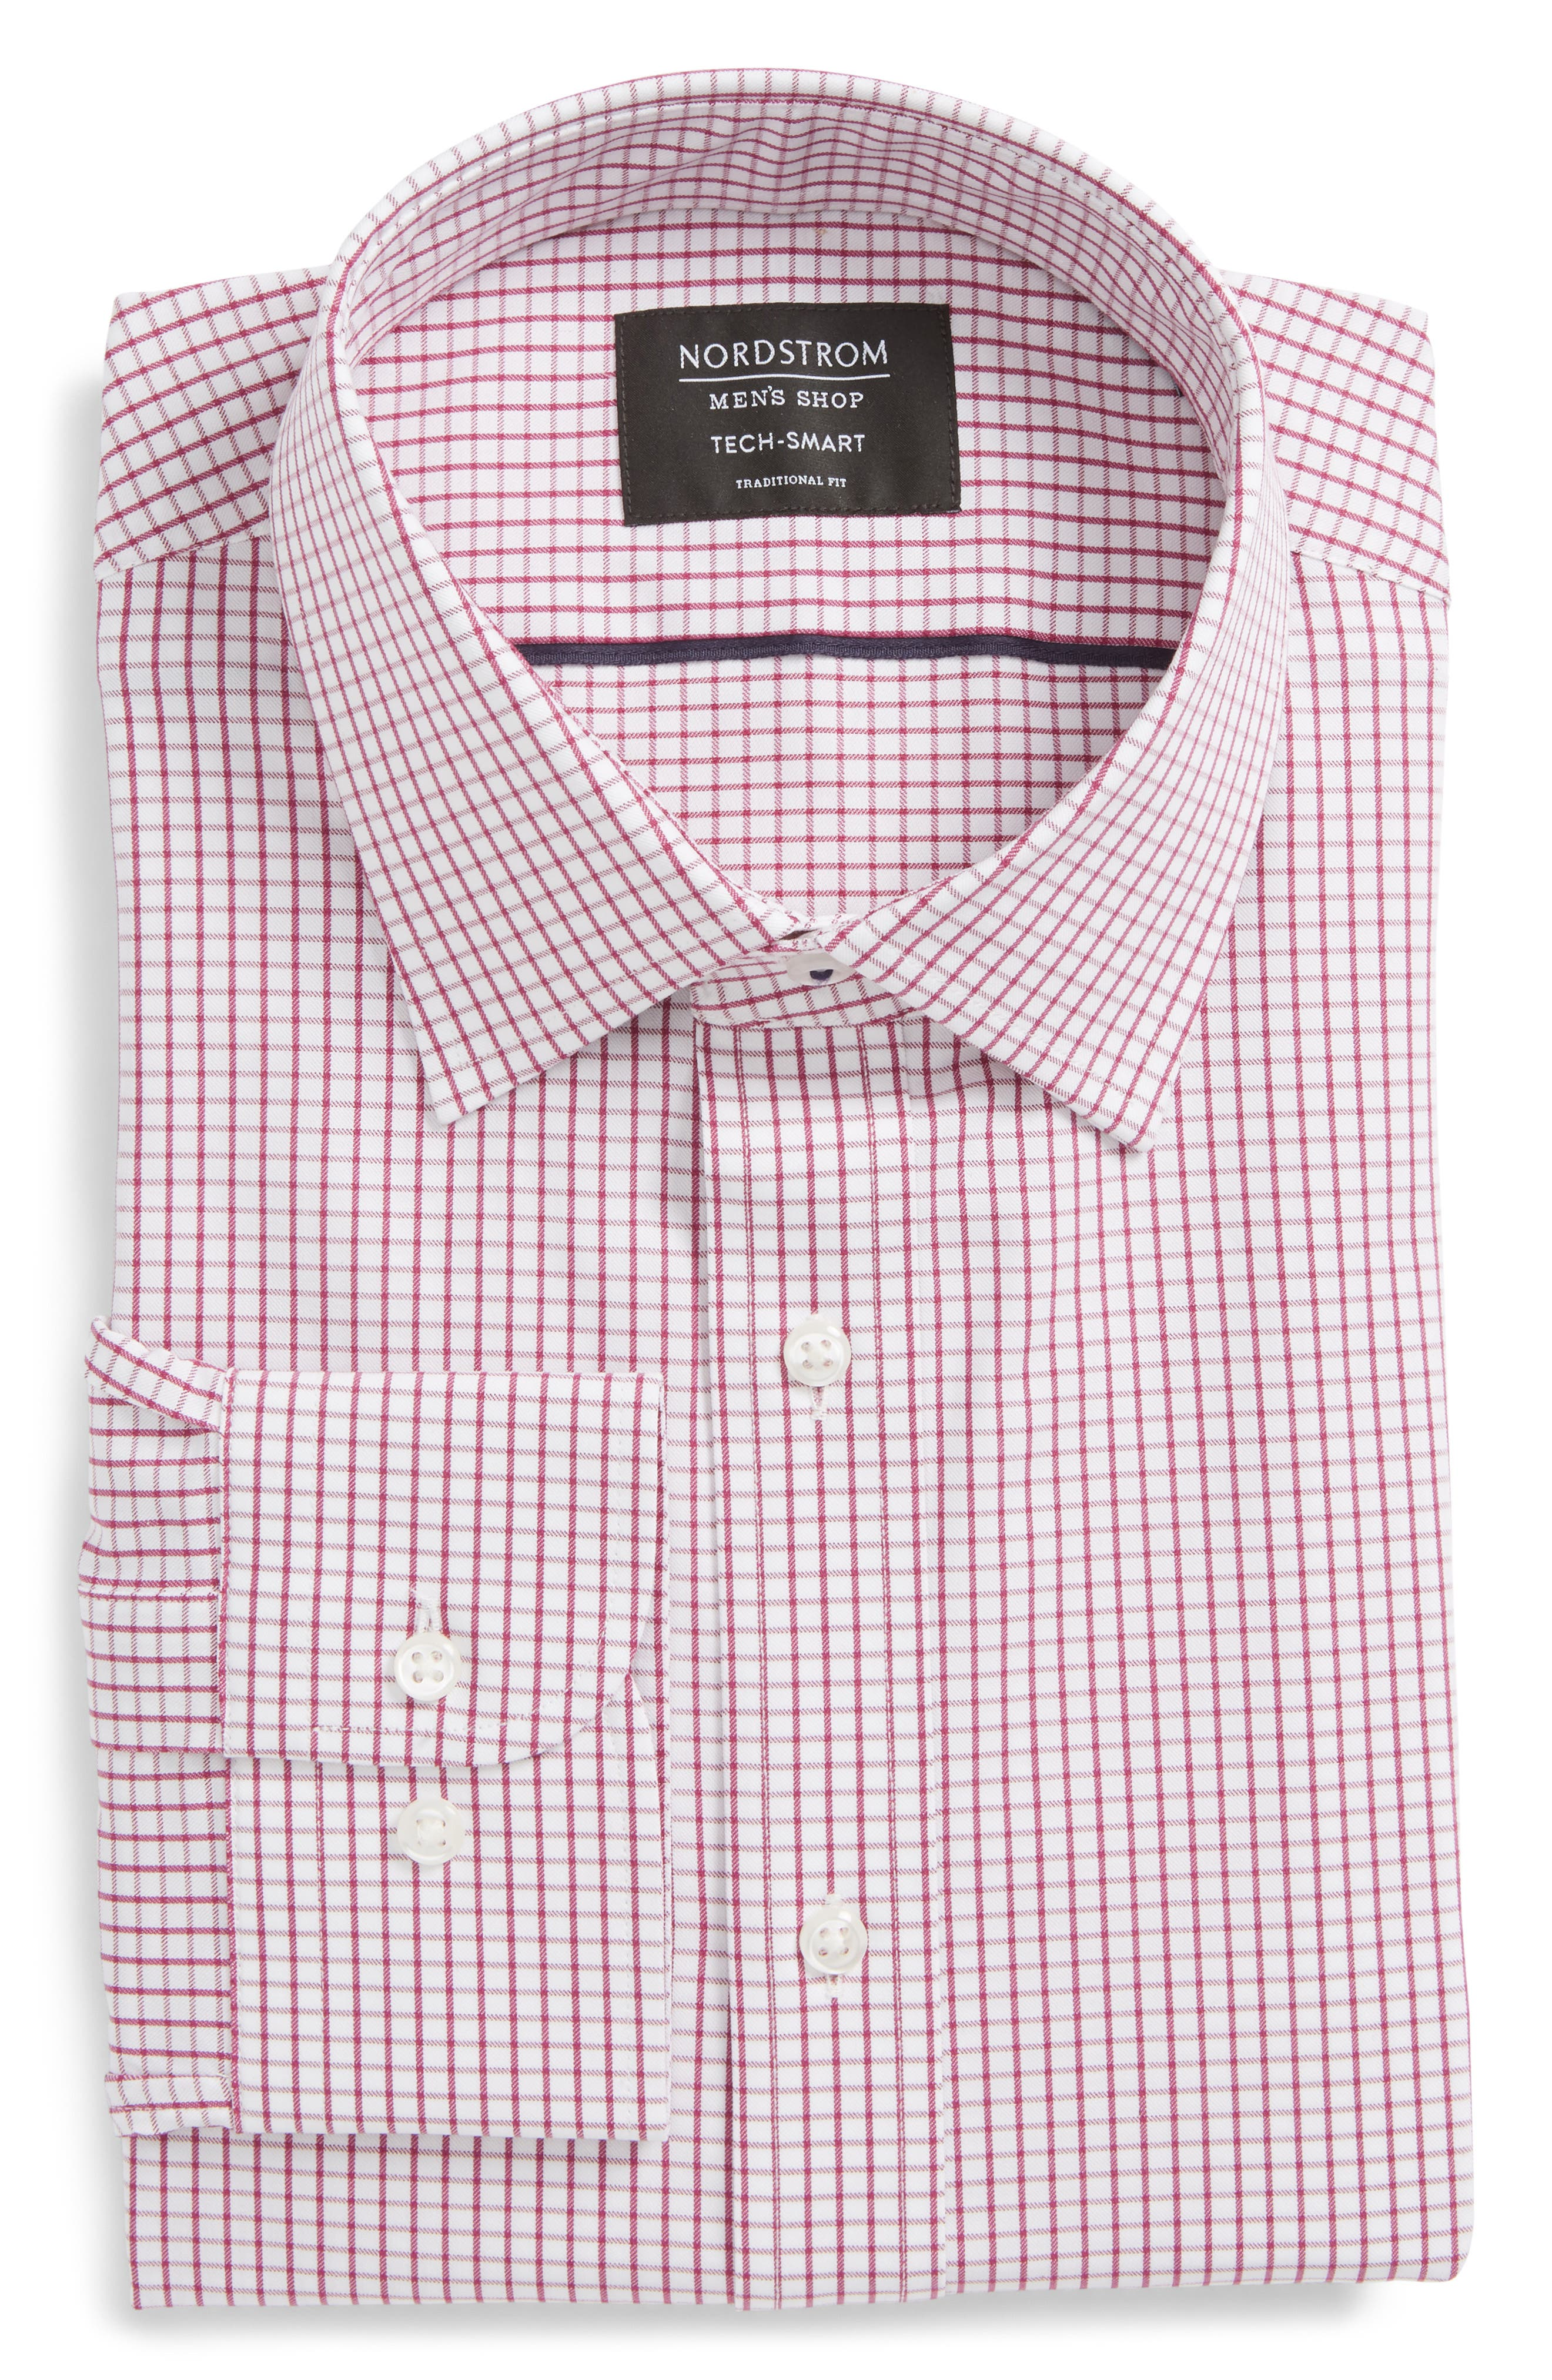 Nordstrom Men's Shop Tech-Smart Traditional Fit Stretch Tattersall Dress Shirt